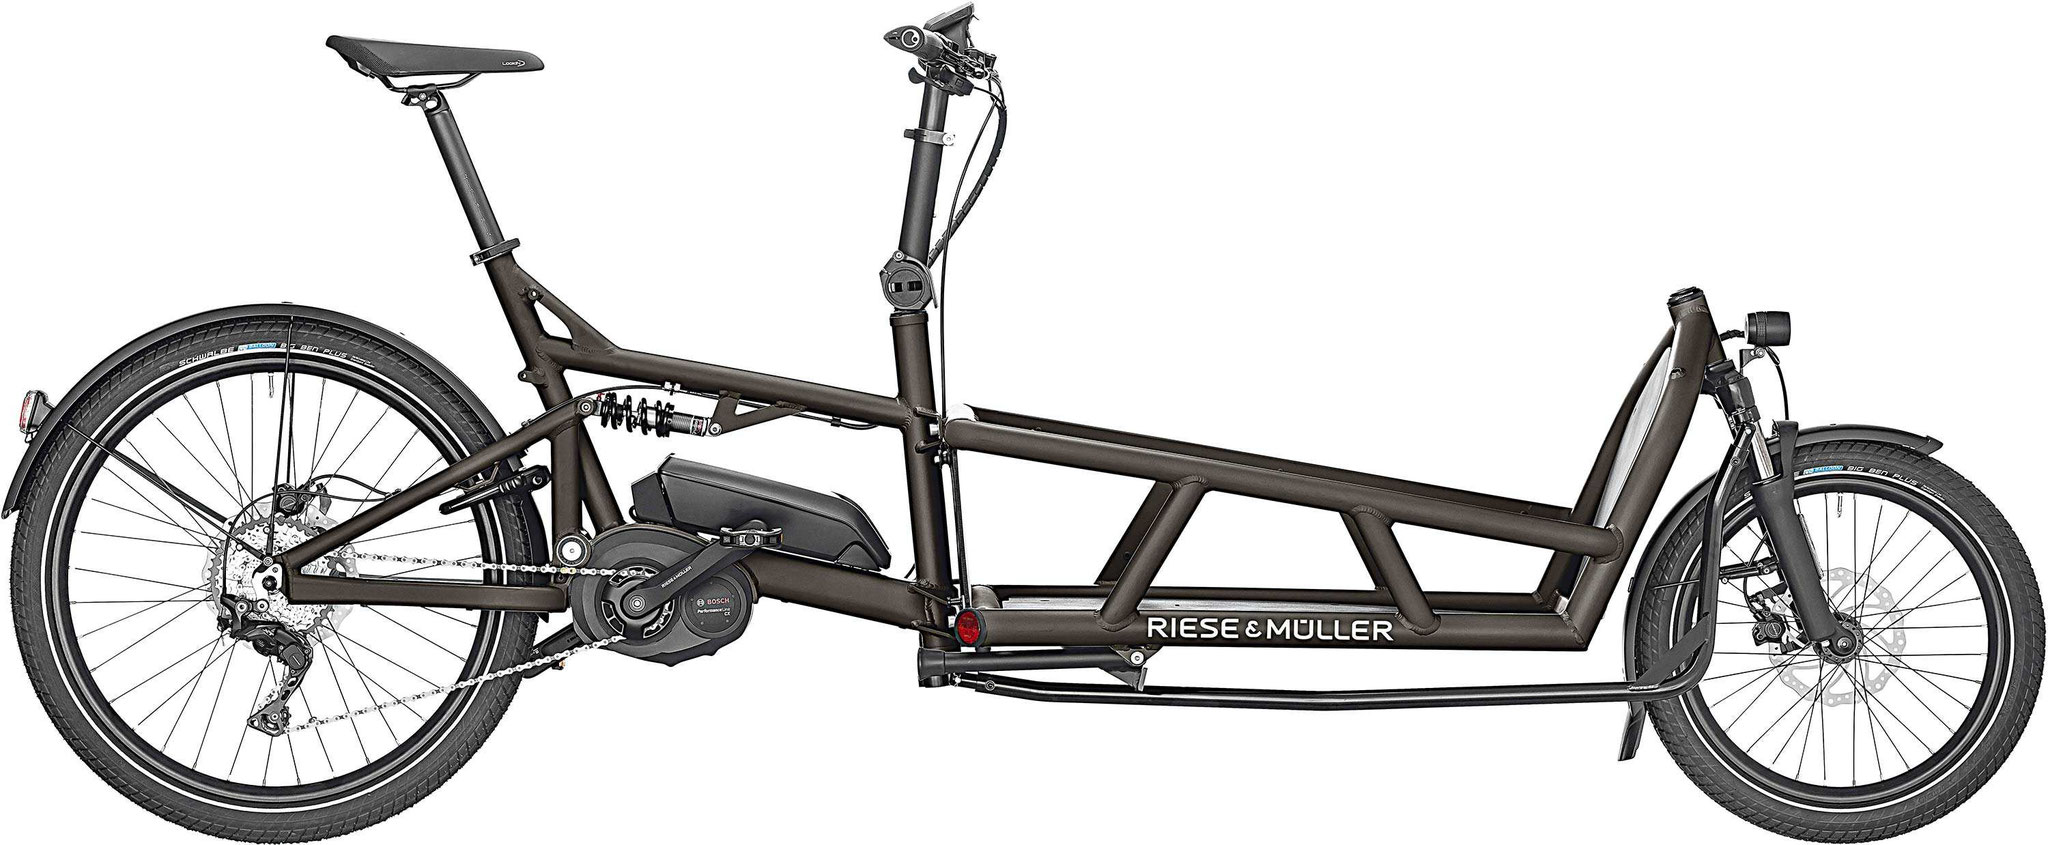 Riese & Müller Load 75 Touring 2019 graphite matt